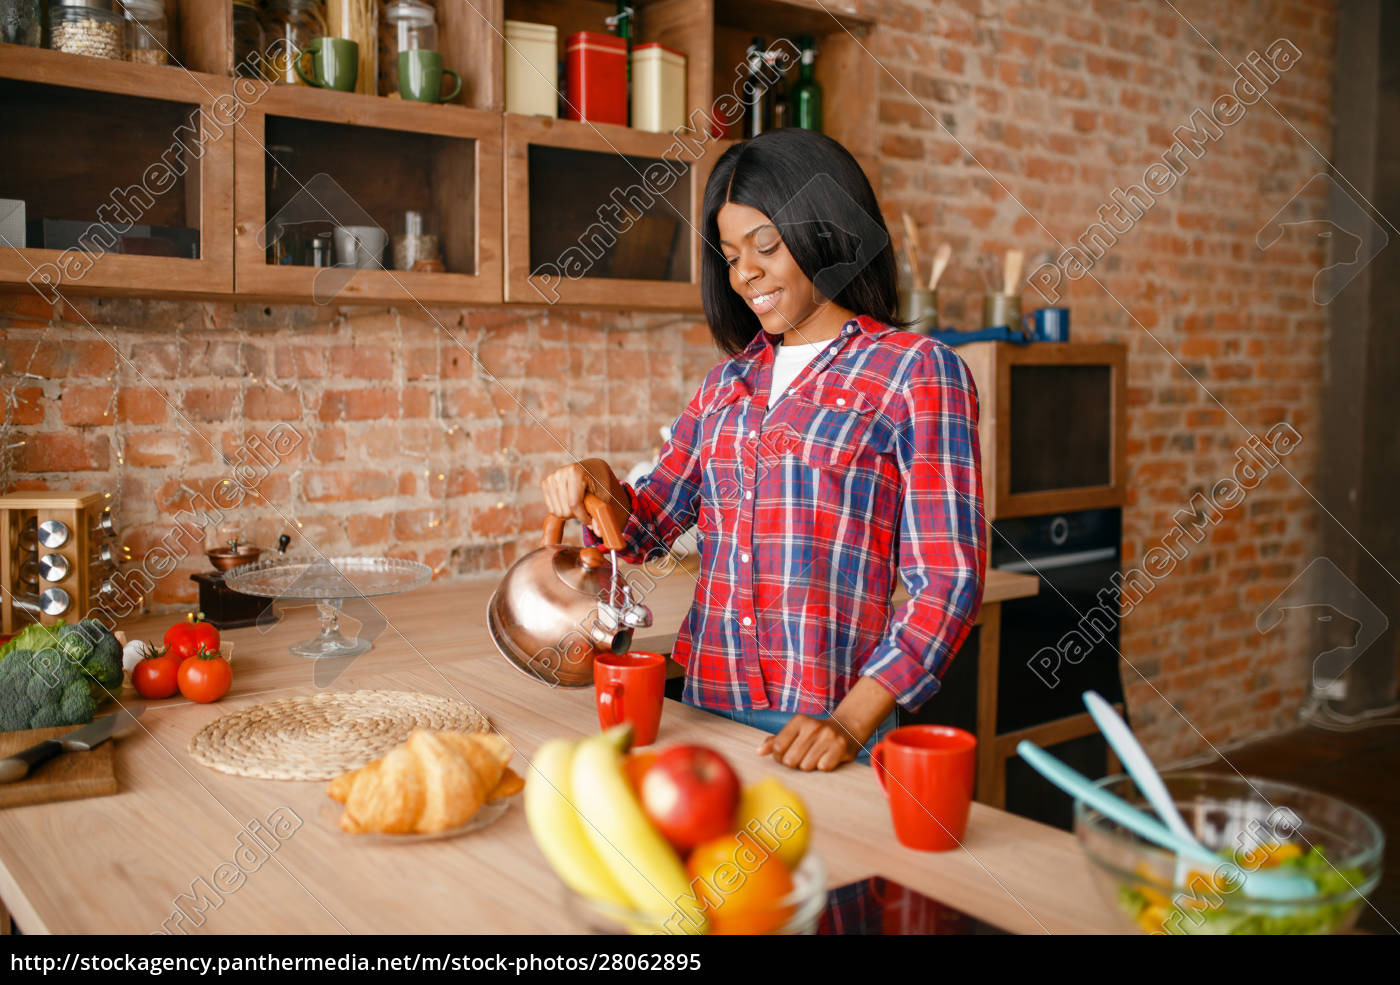 black, woman, prepares, coffee, on, the - 28062895